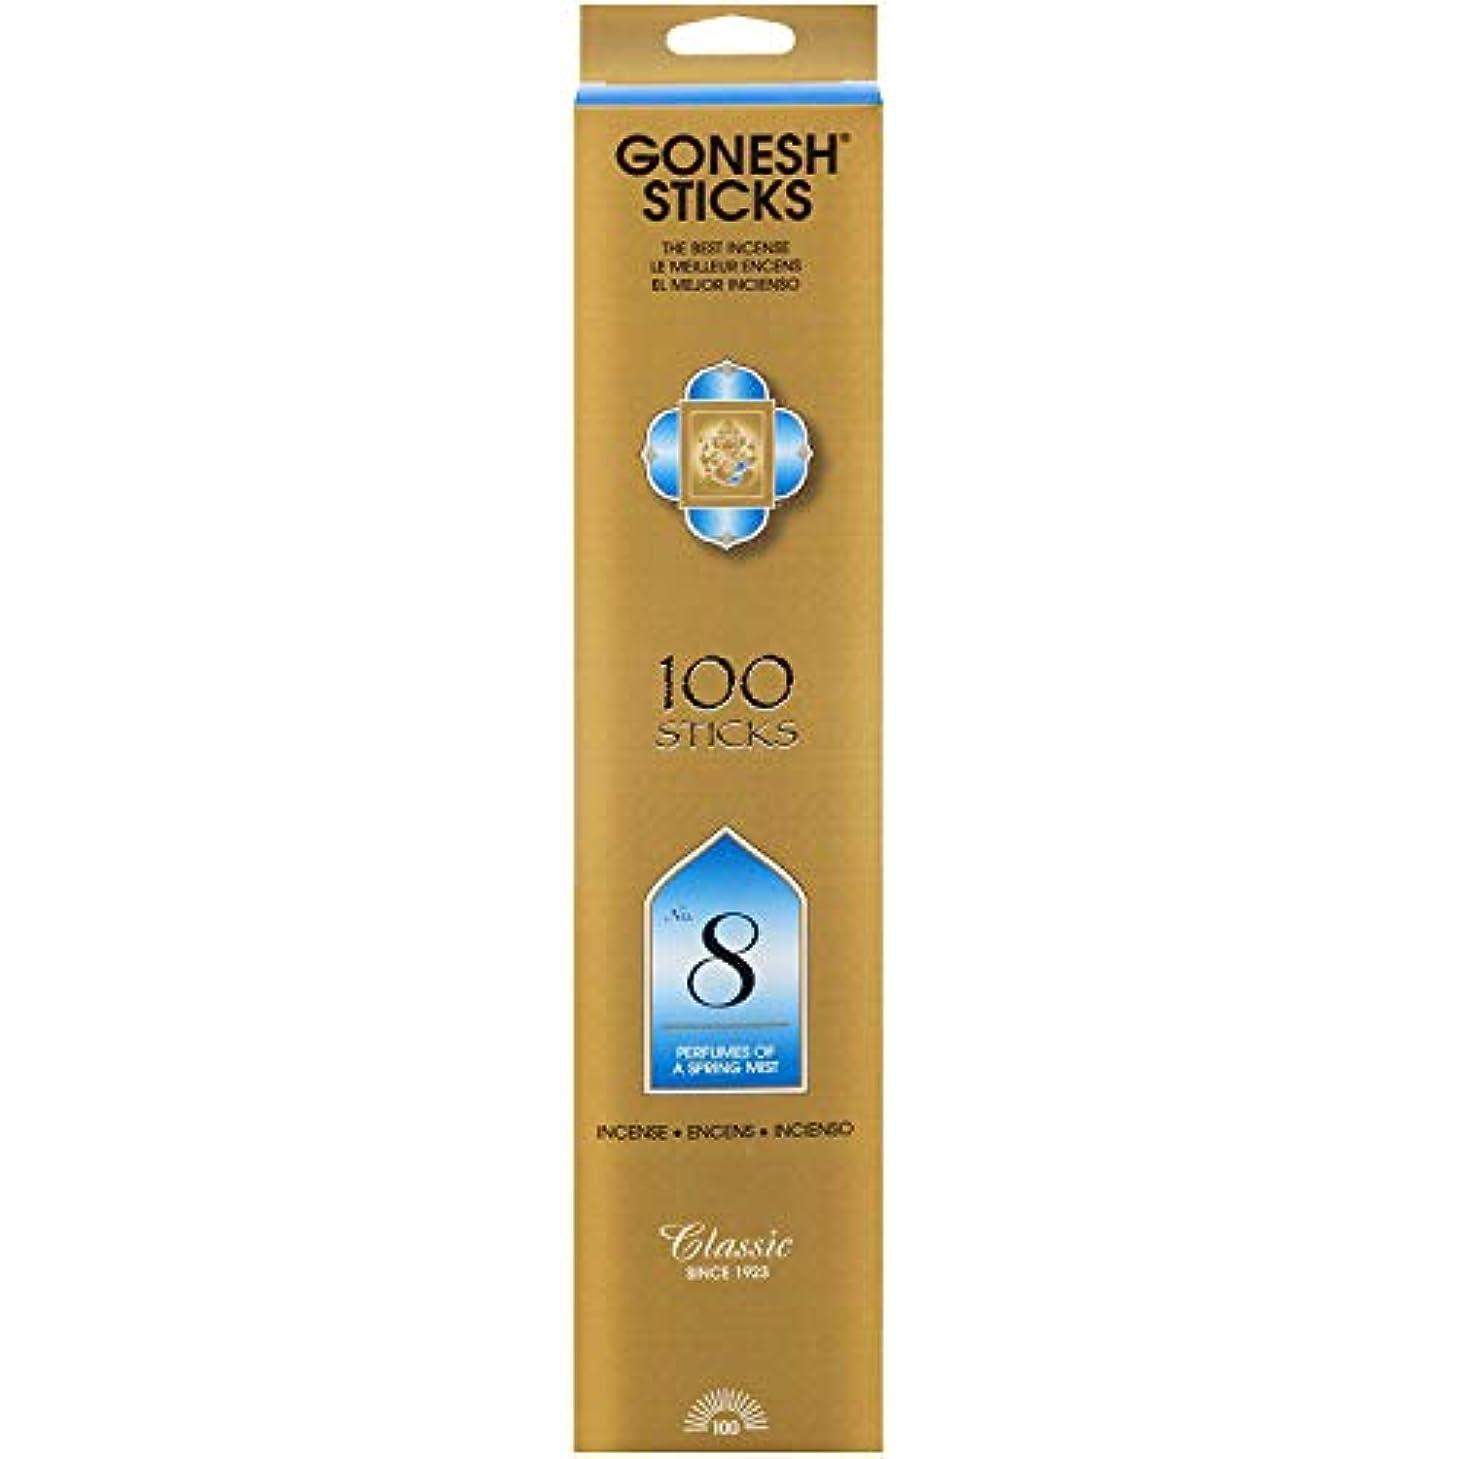 GONESH インセンス No.8 スティック 100本入 セット販売 (2個)